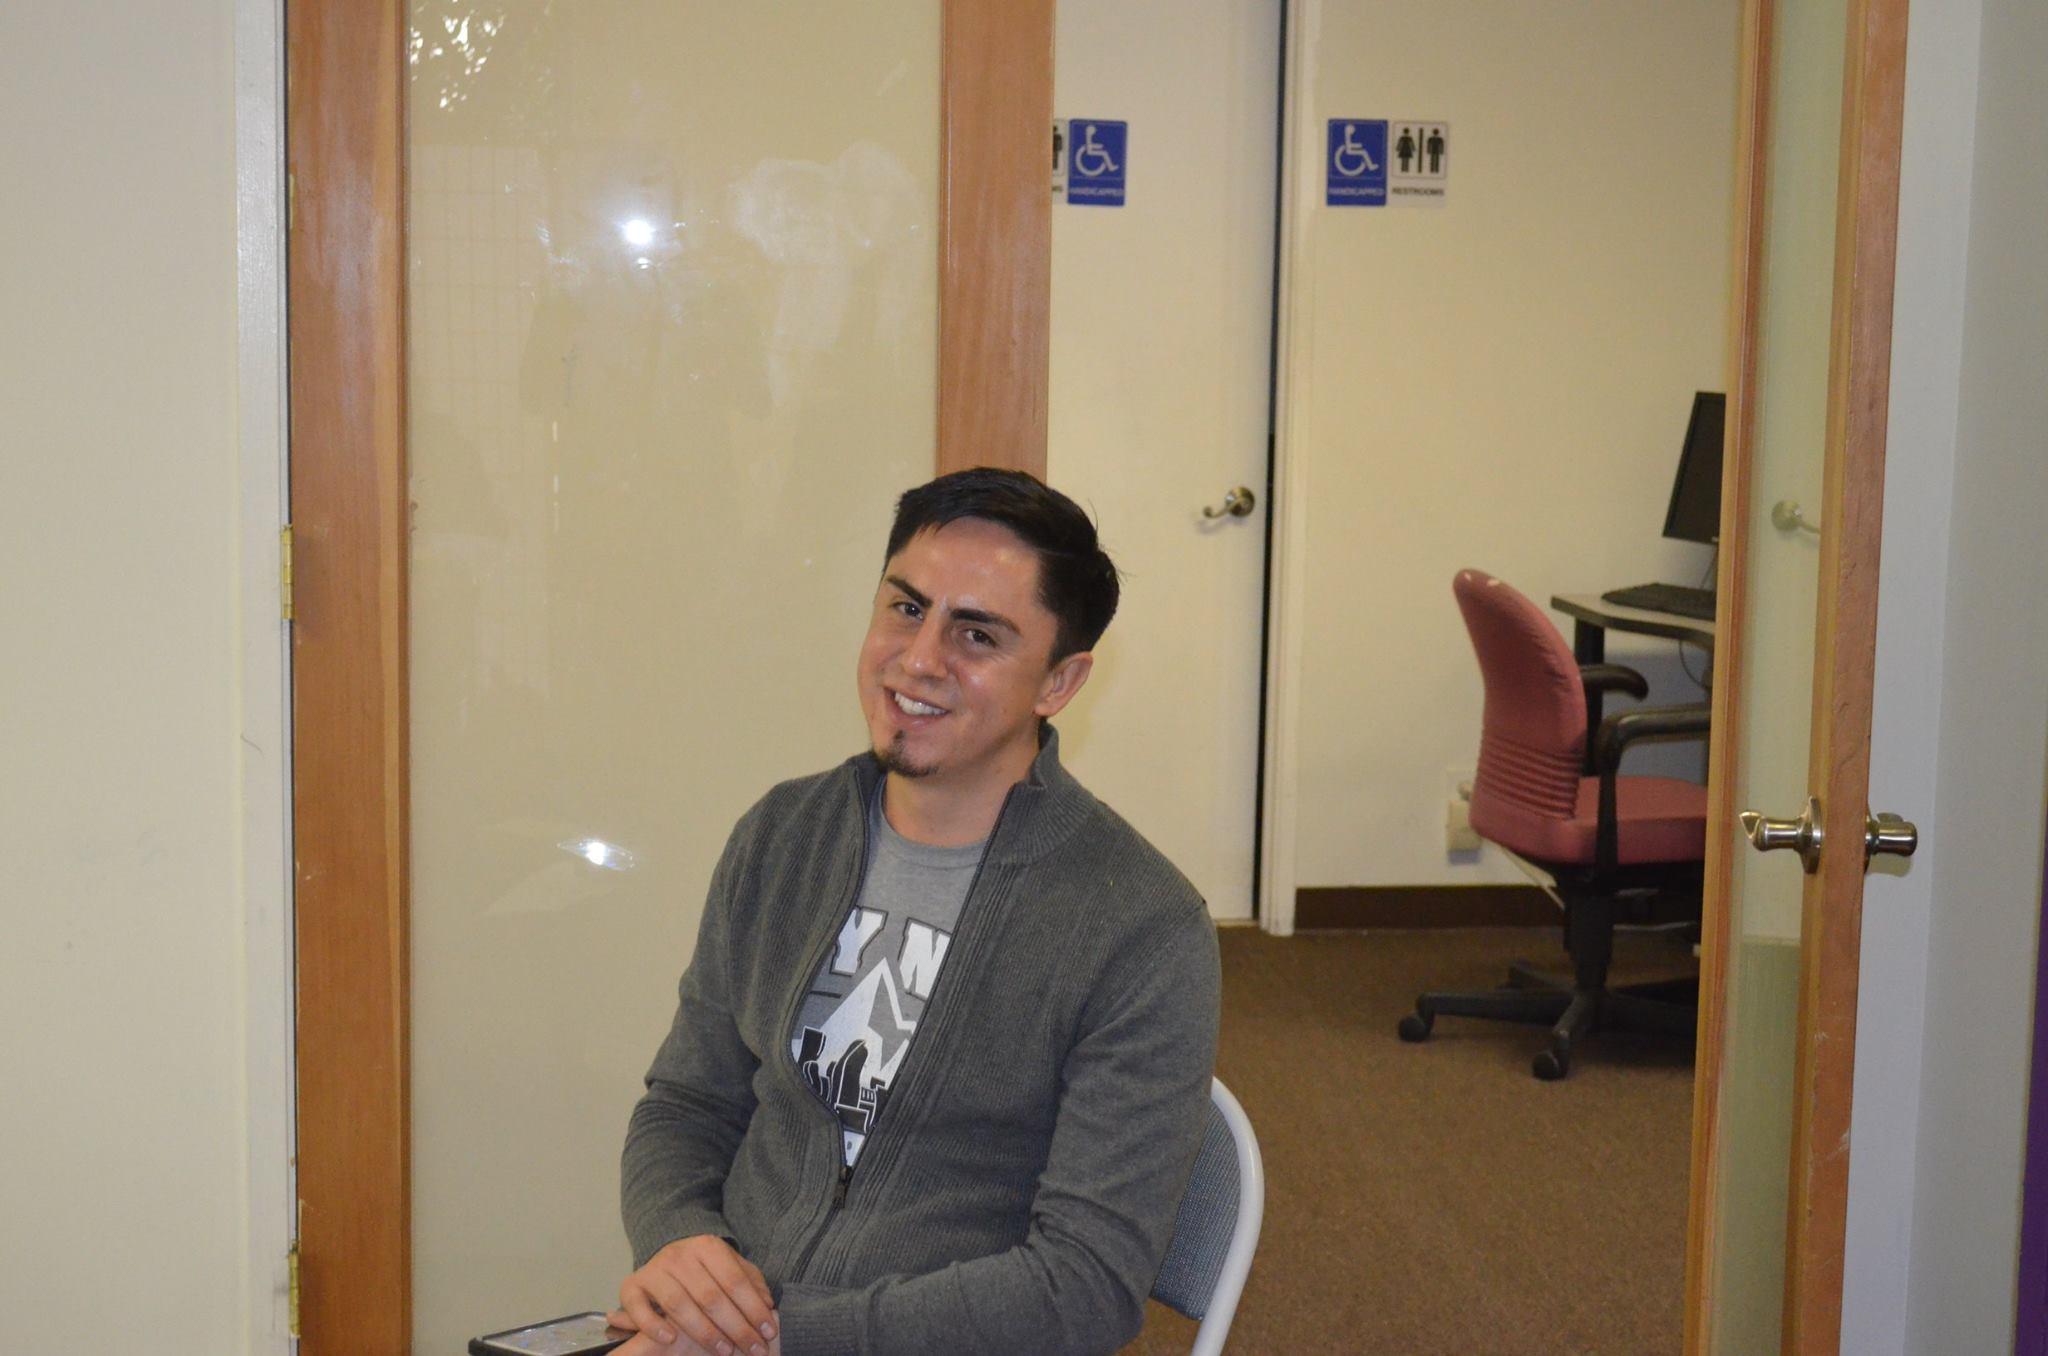 University of Colorado, Denver Student Vlounteer